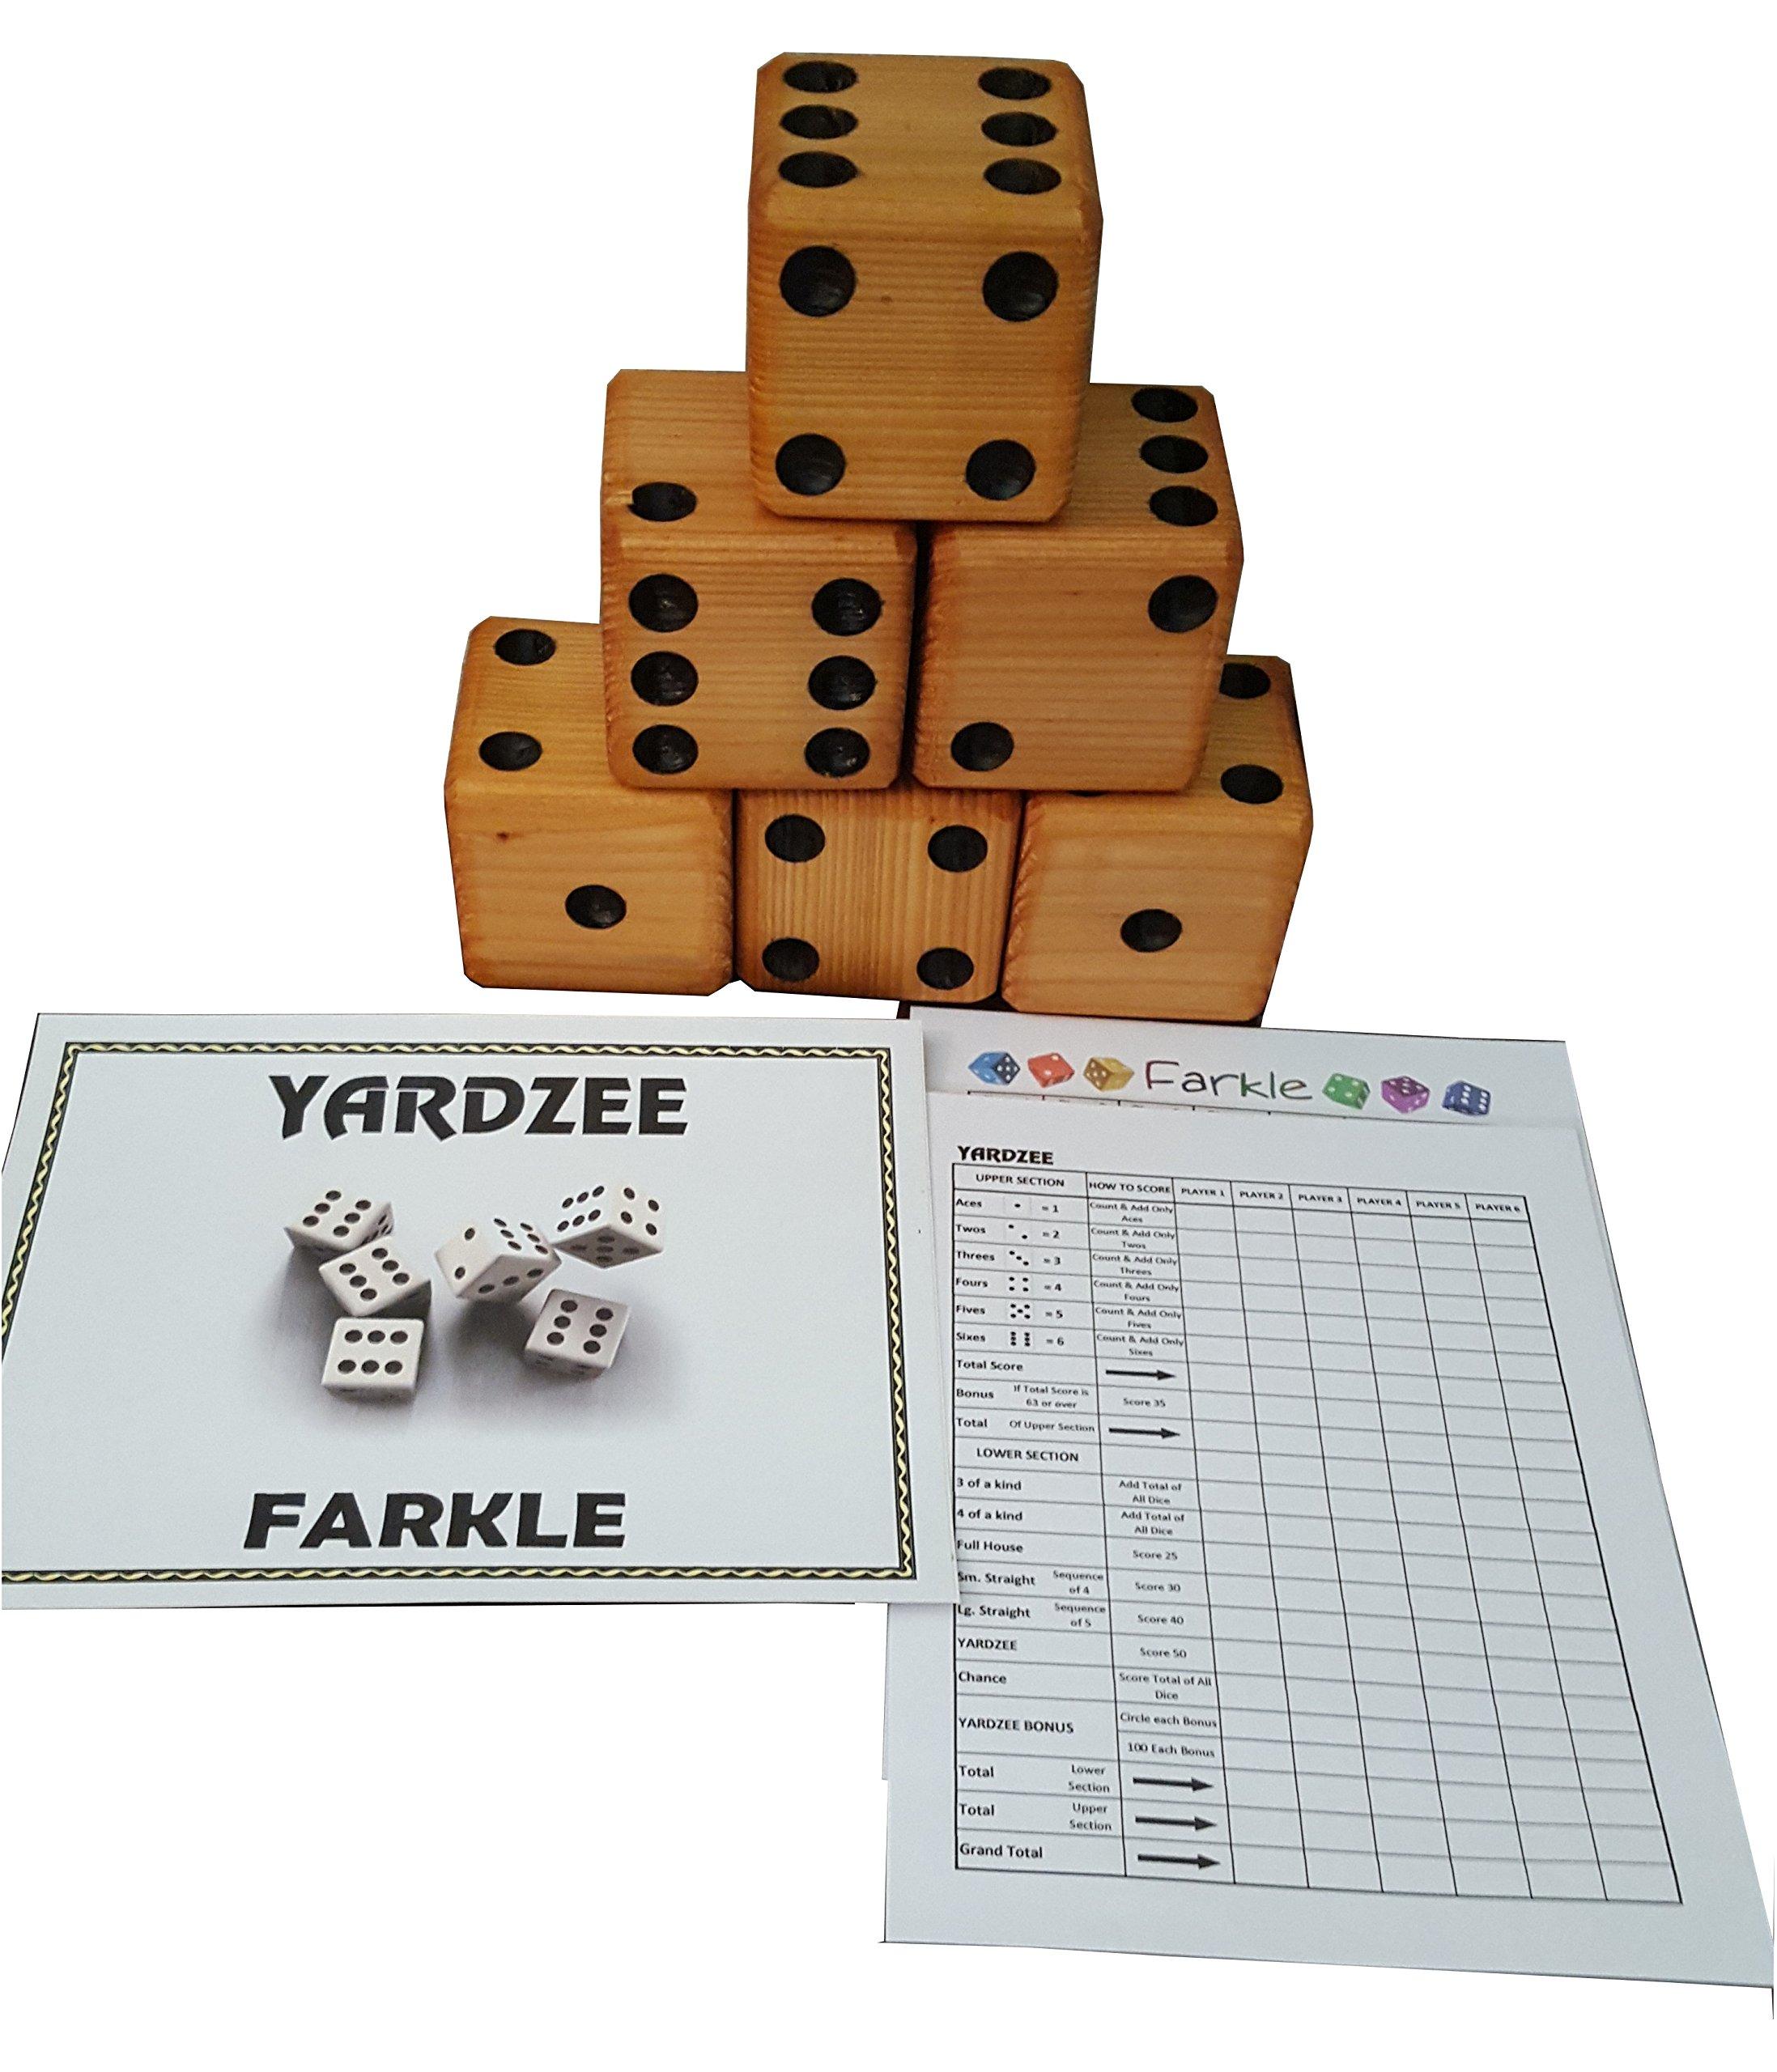 YARDZEE FARKLE Huge Big Giant Outdoor Yard Dice Game Solid Cedar (Bucket Label Only)